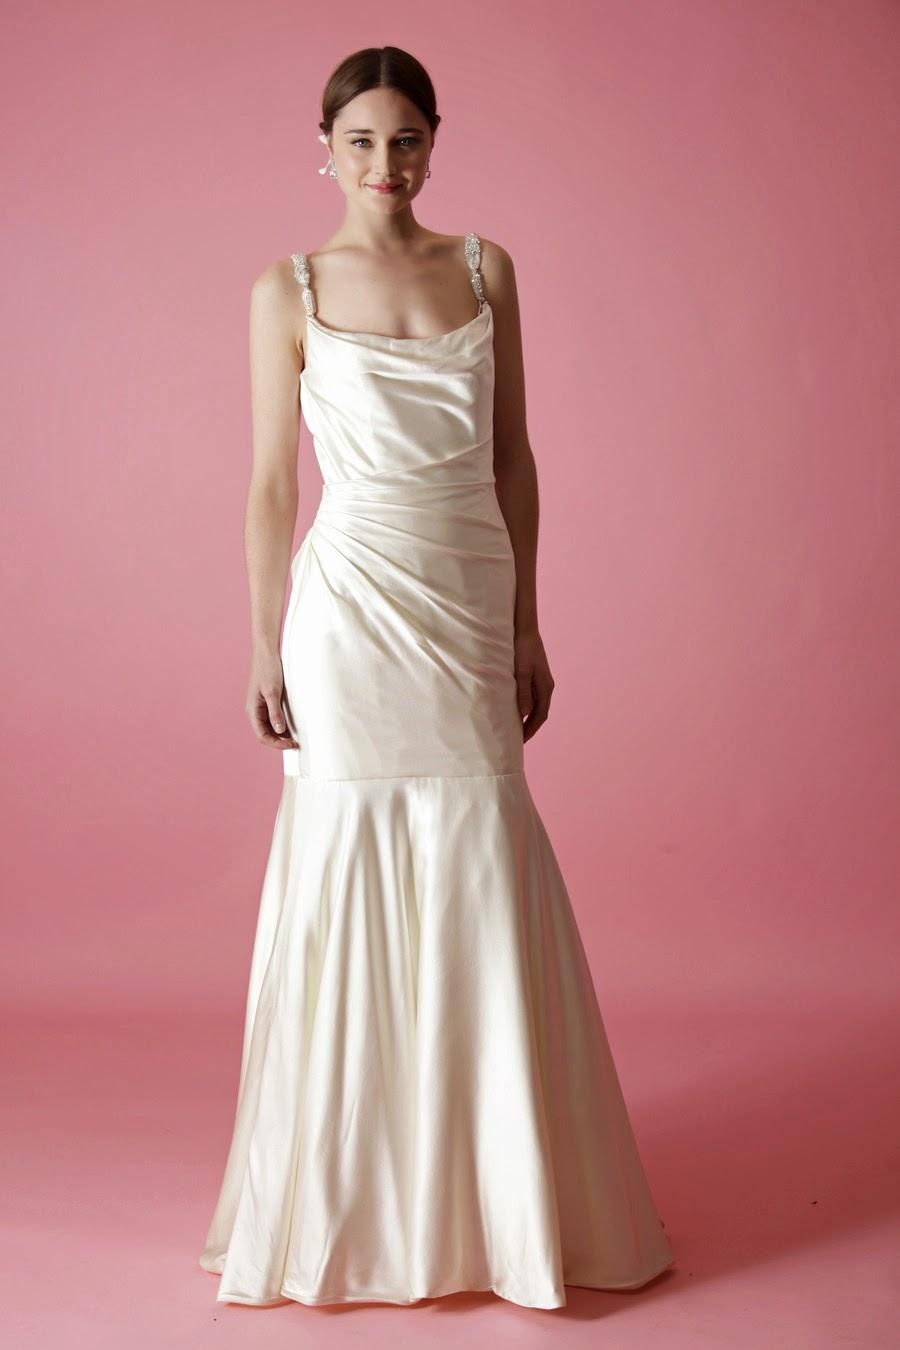 Berühmt Vestido De Novia Zivil Fotos - Brautkleider Ideen - cashingy ...